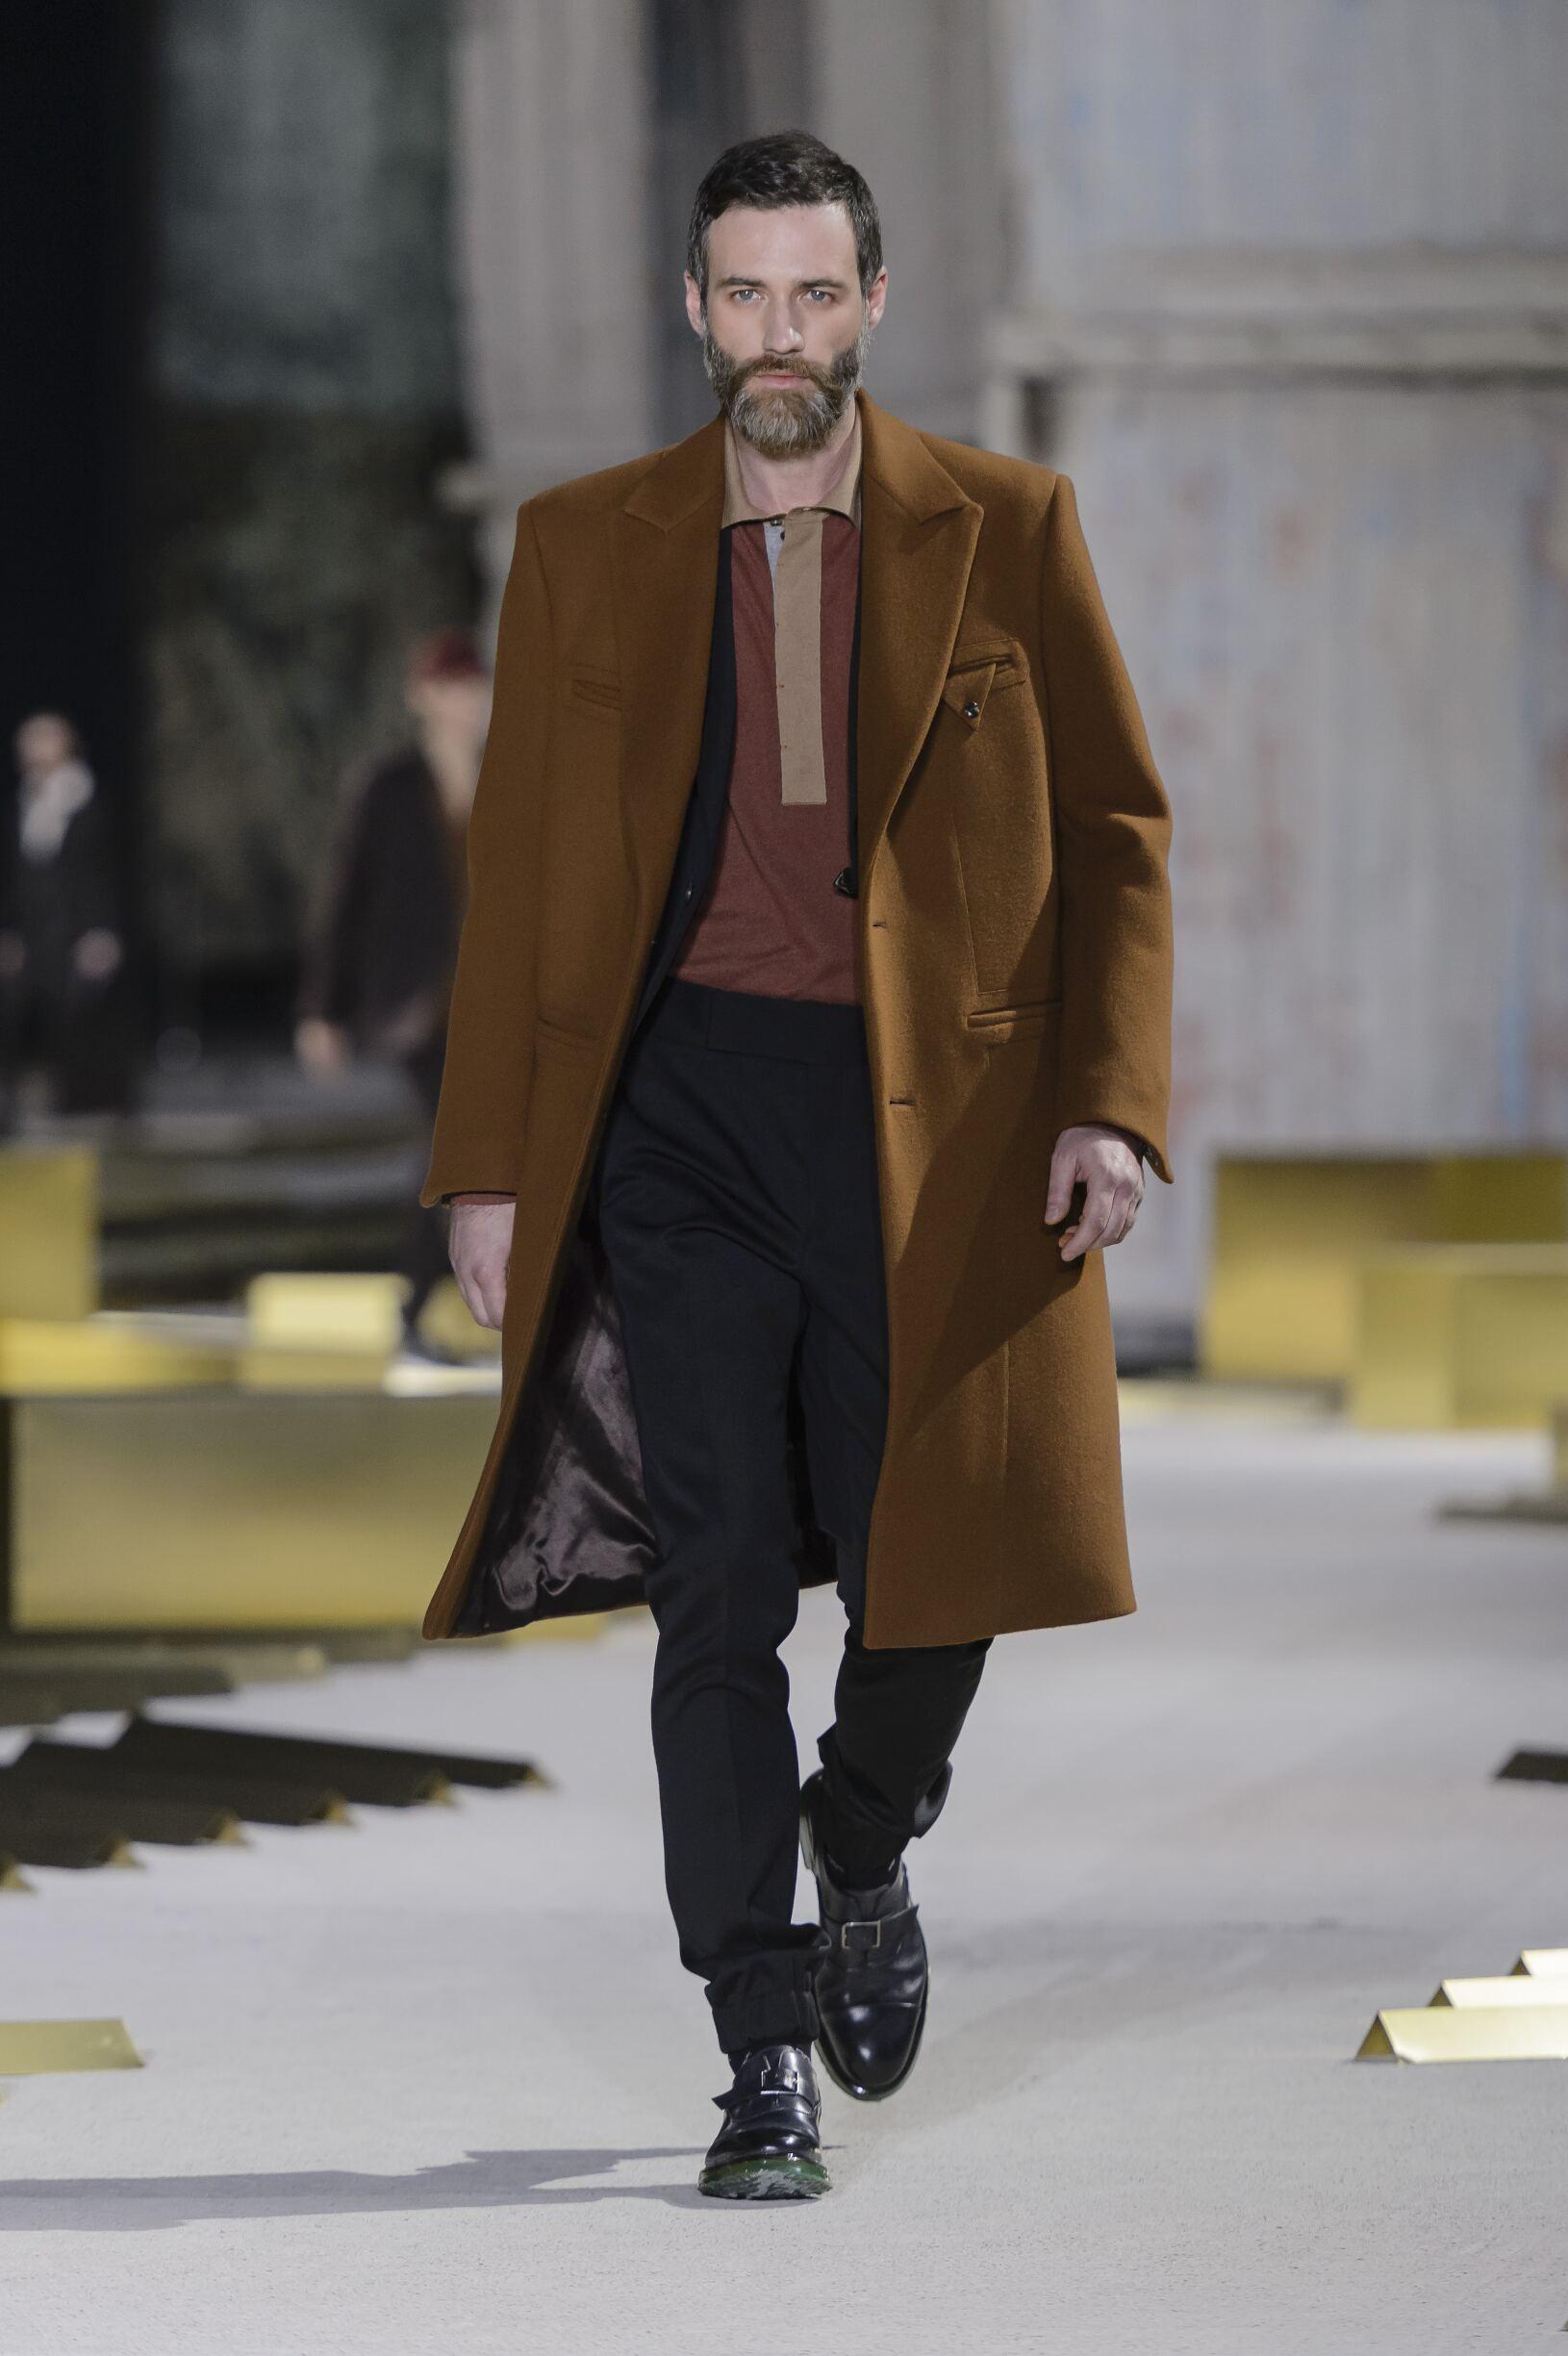 Catwalk Ermenegildo Zegna Man Fashion Show Winter 2017